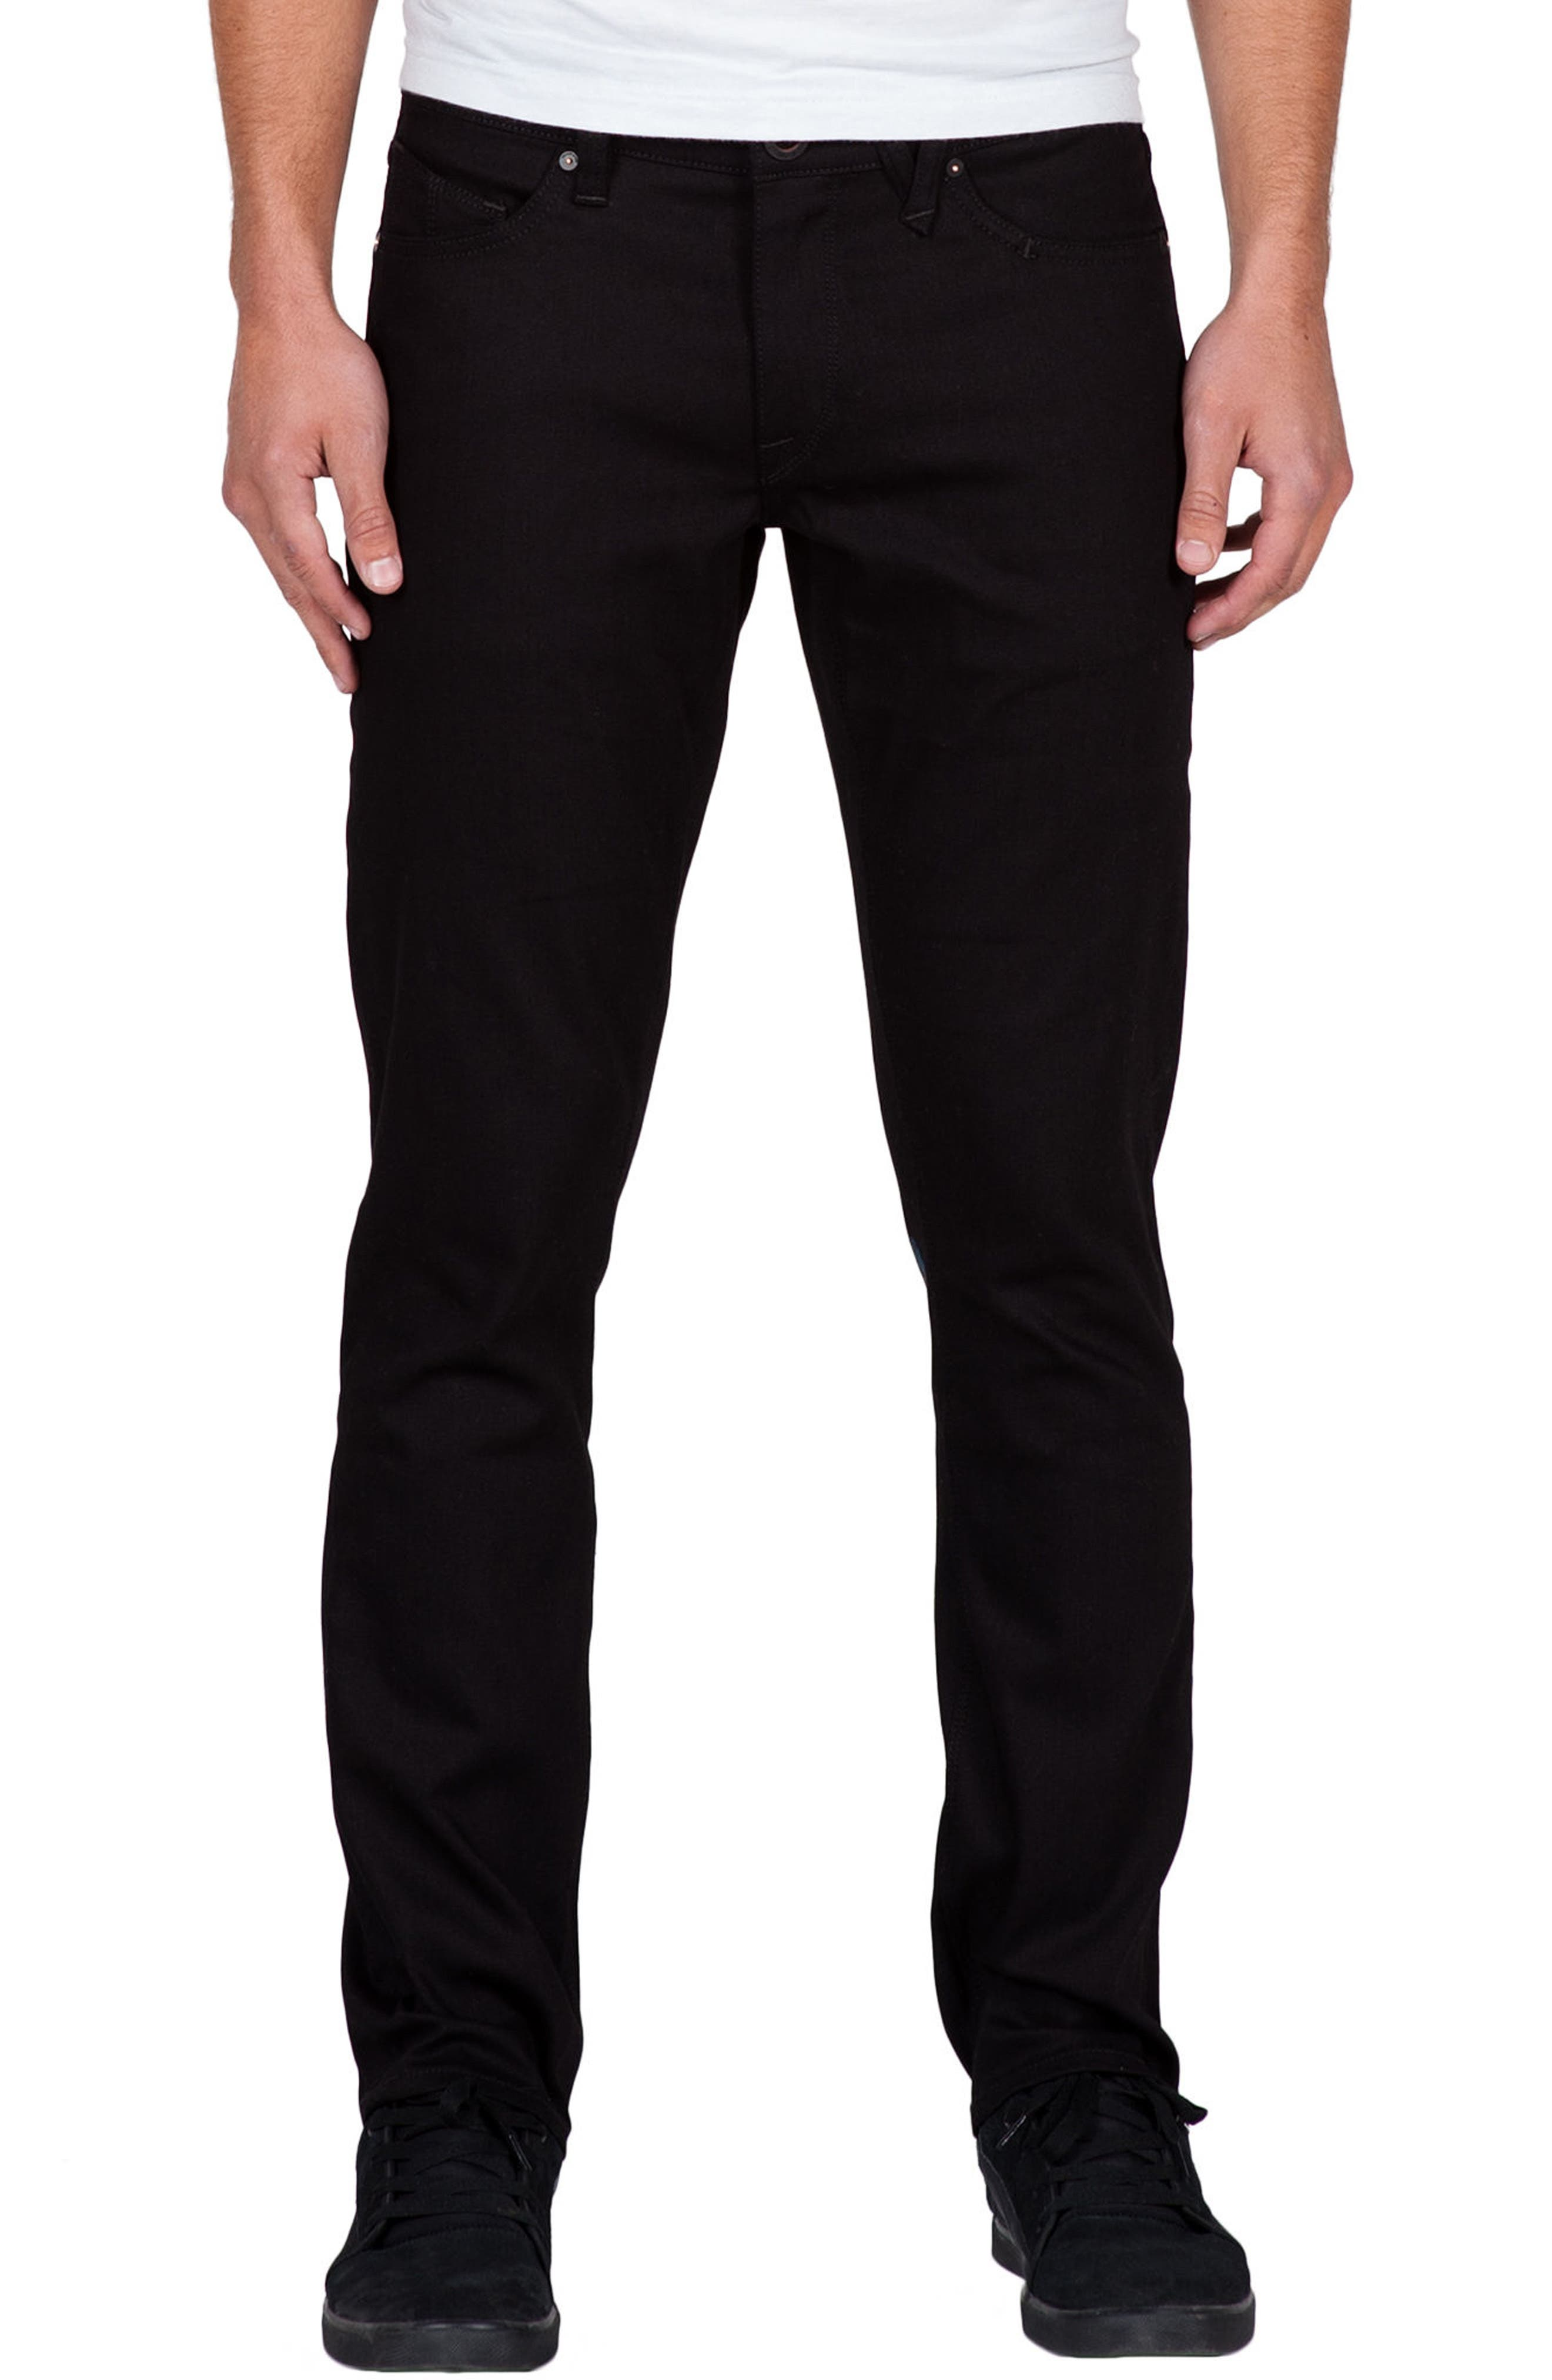 Alternate Image 1 Selected - Volcom Vorta Slim Fit Jeans